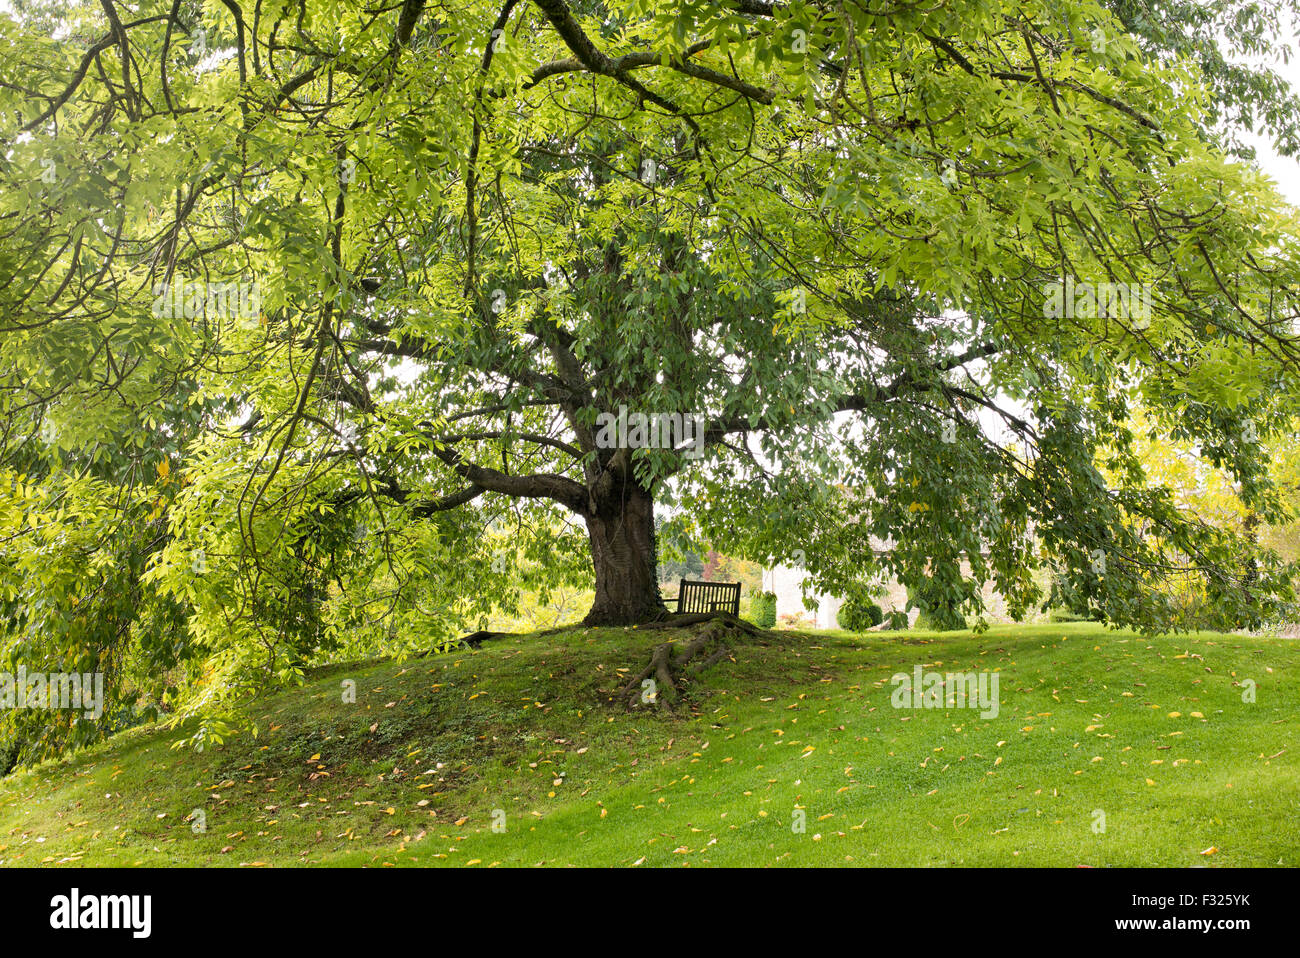 Carpinus betulus. Hornbeam tree in Broad Campden, Gloucestershire, Cotswolds, England - Stock Image